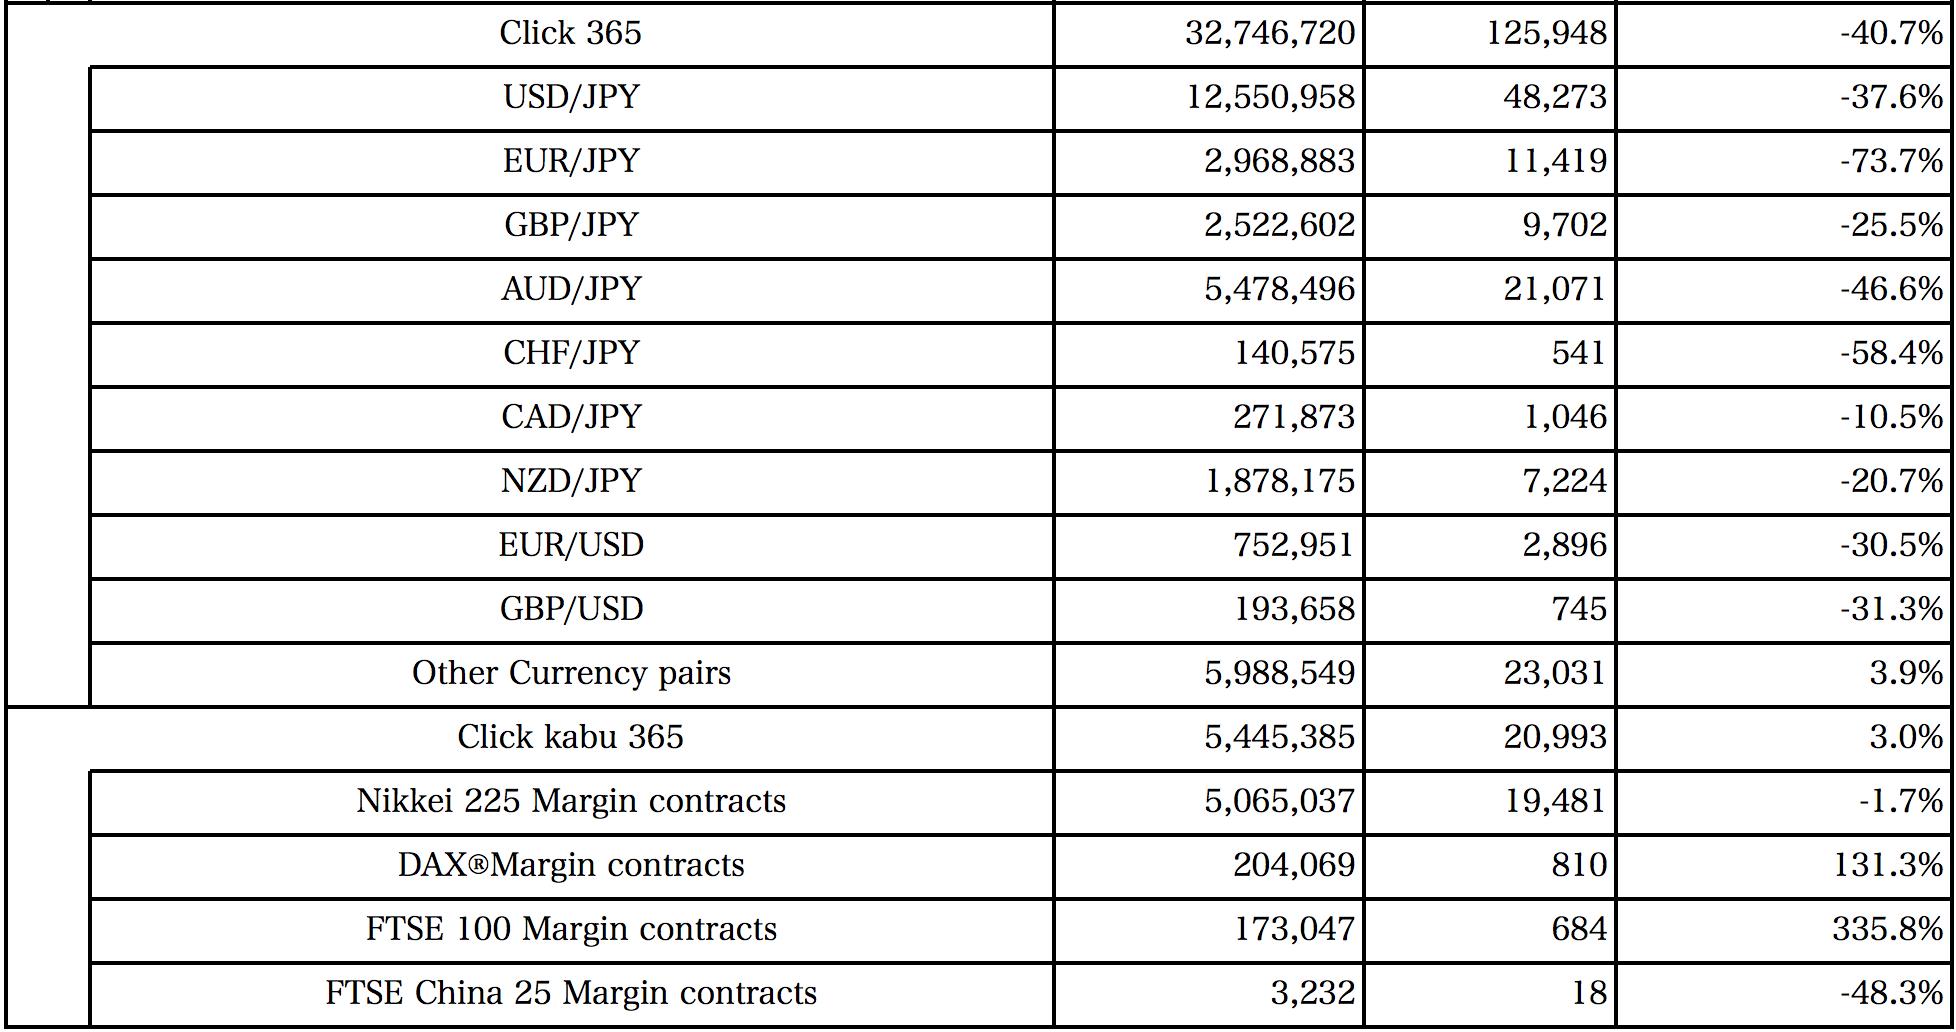 Tokyo Financial Exchange Total Trading Volumes 2014